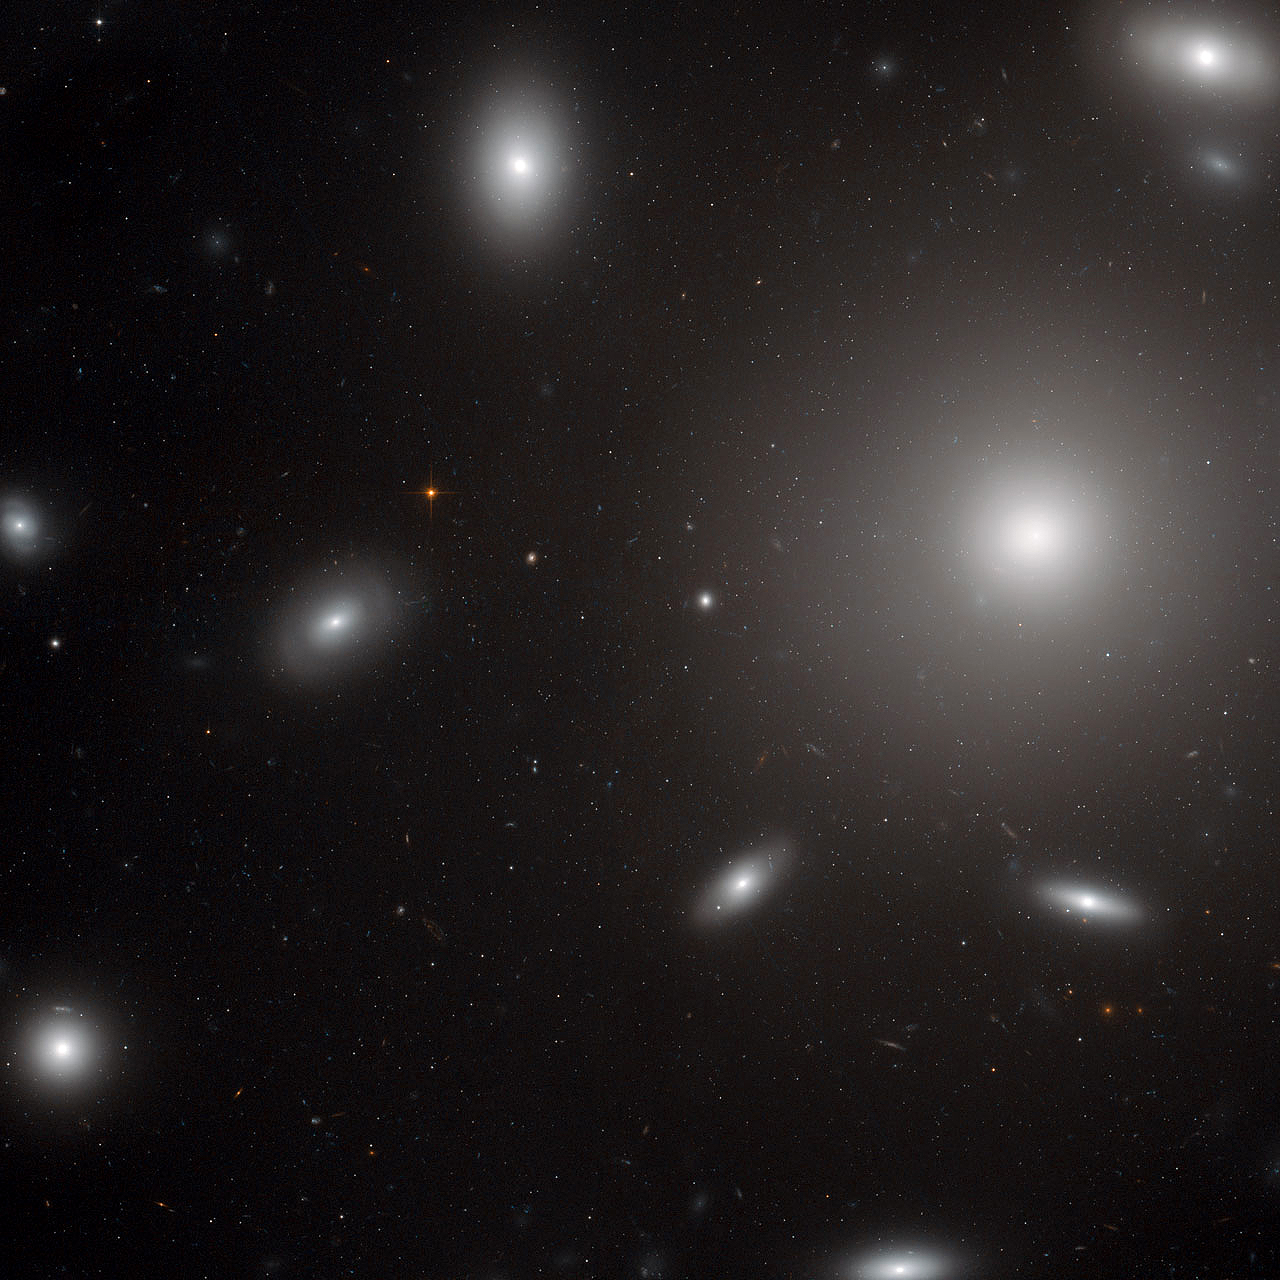 giant elliptical galaxies - photo #14